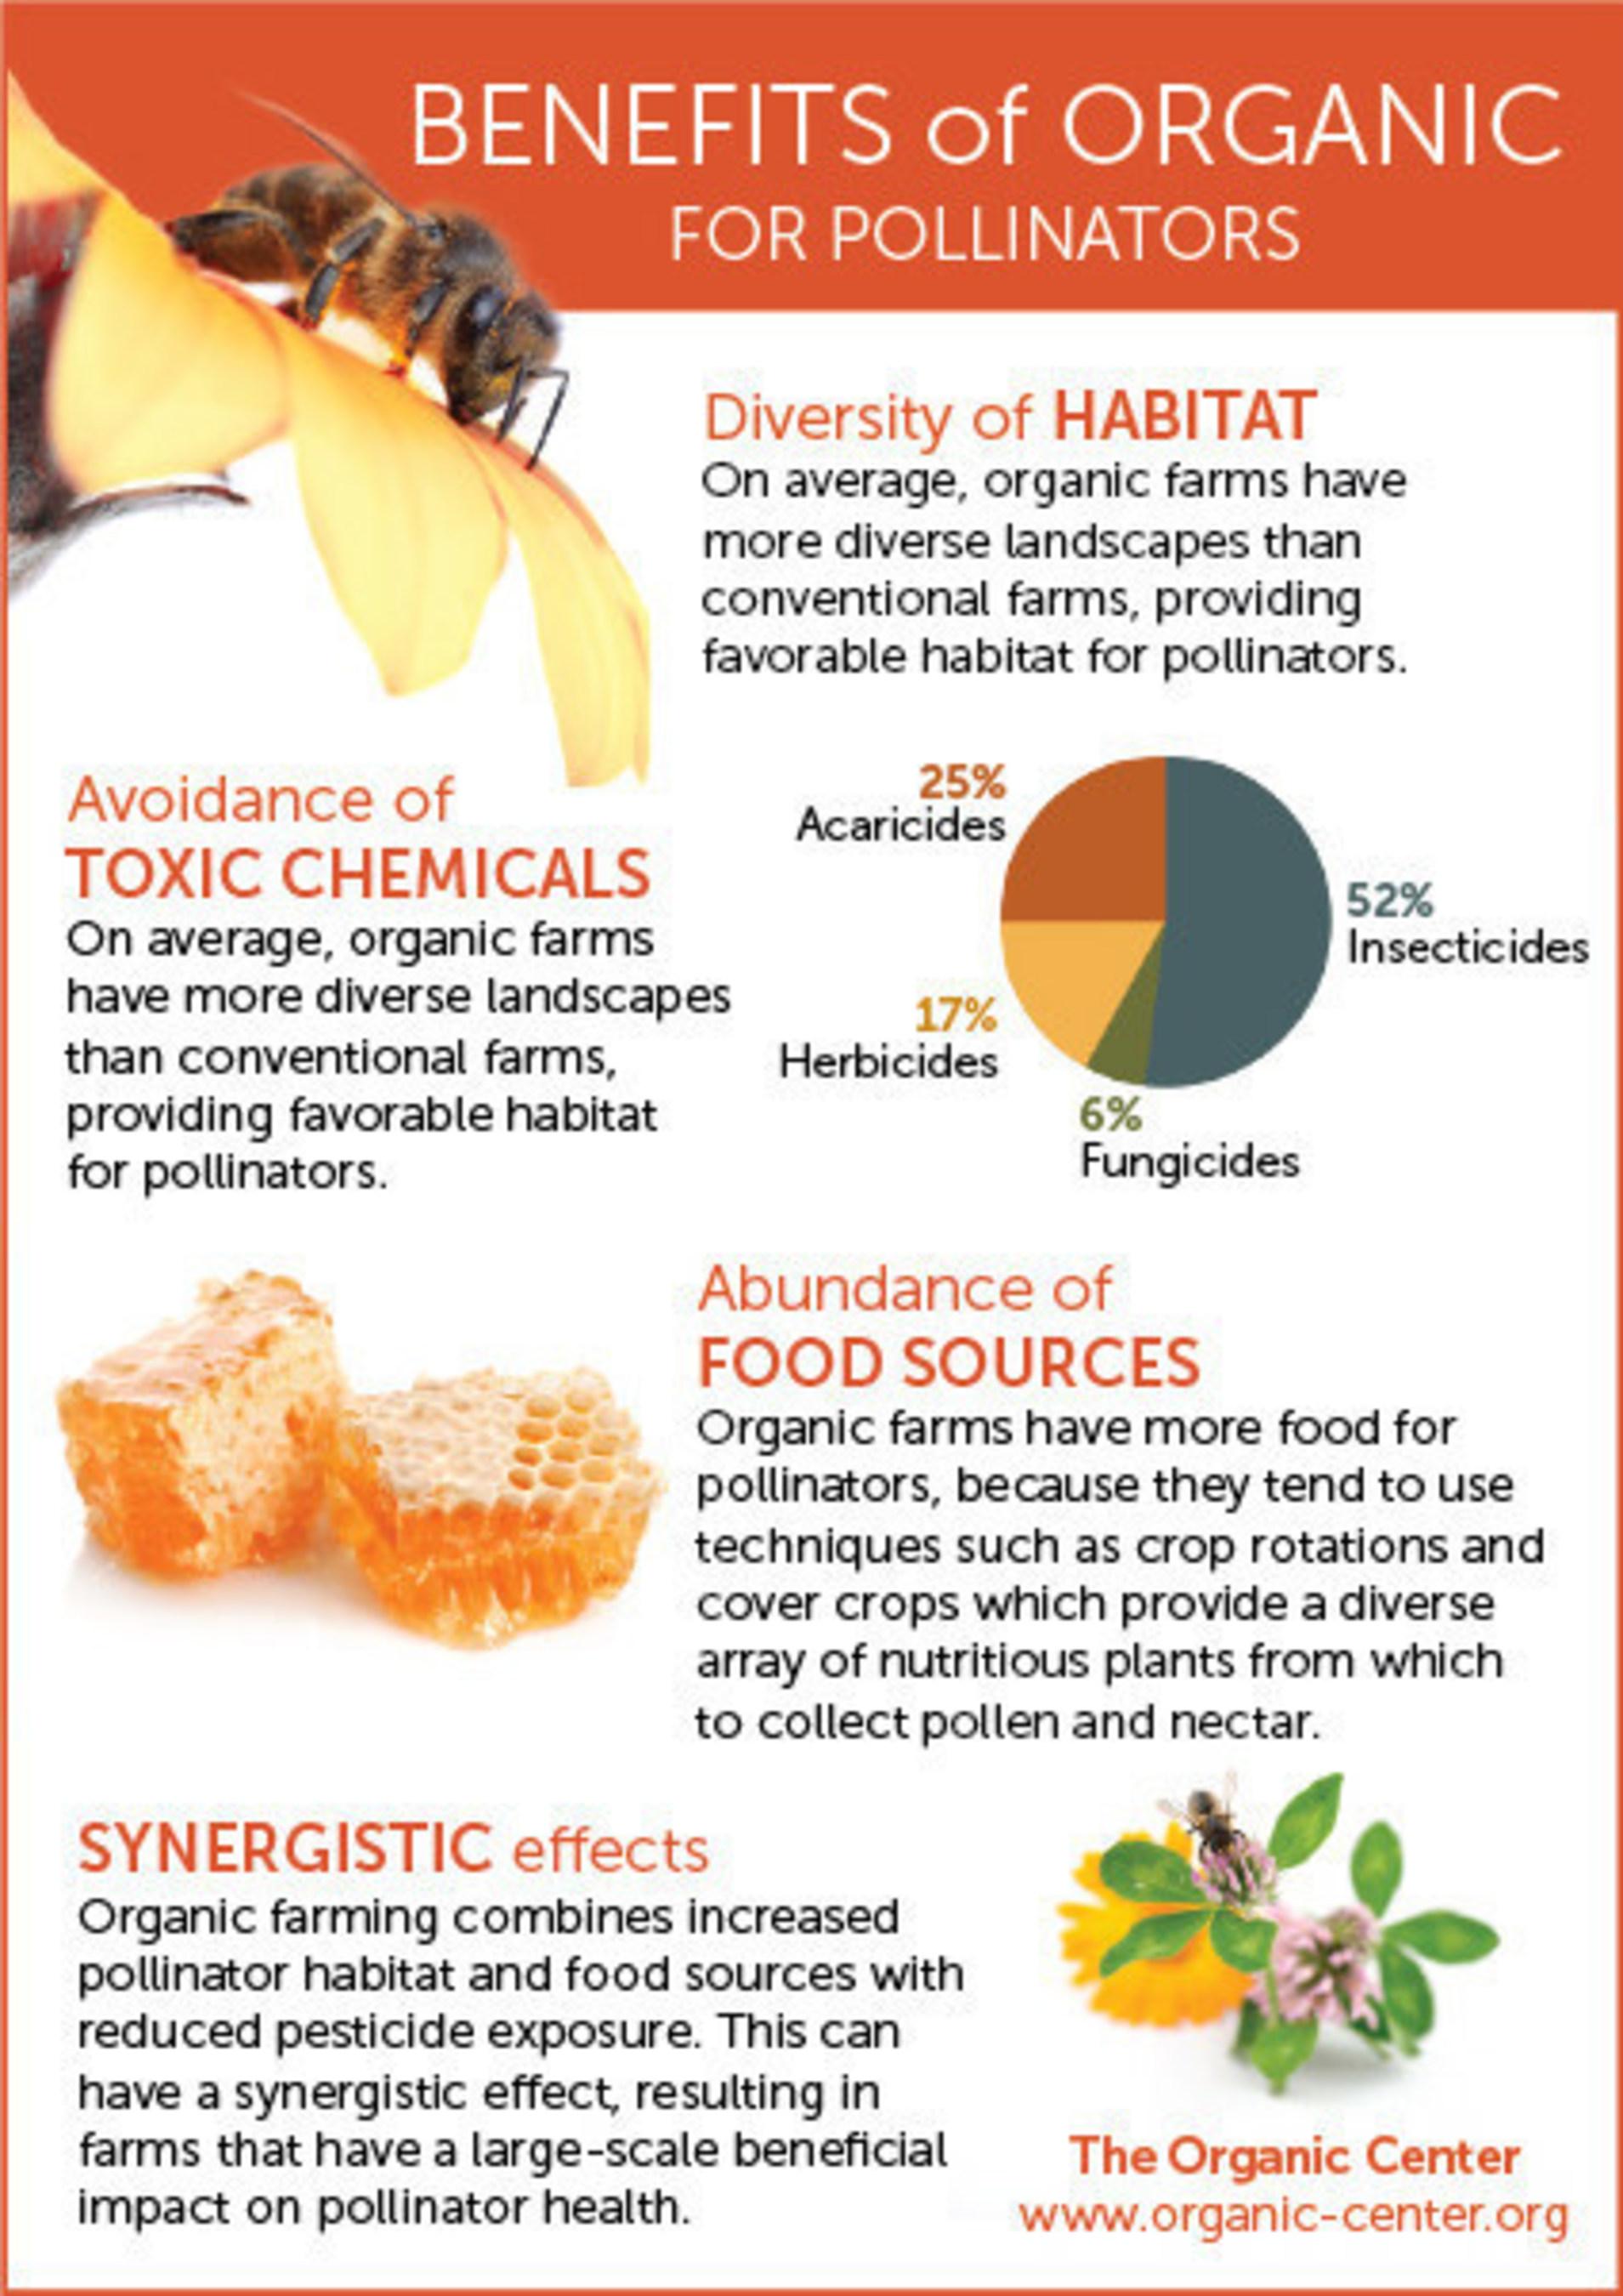 Organic practices benefit pollinator health